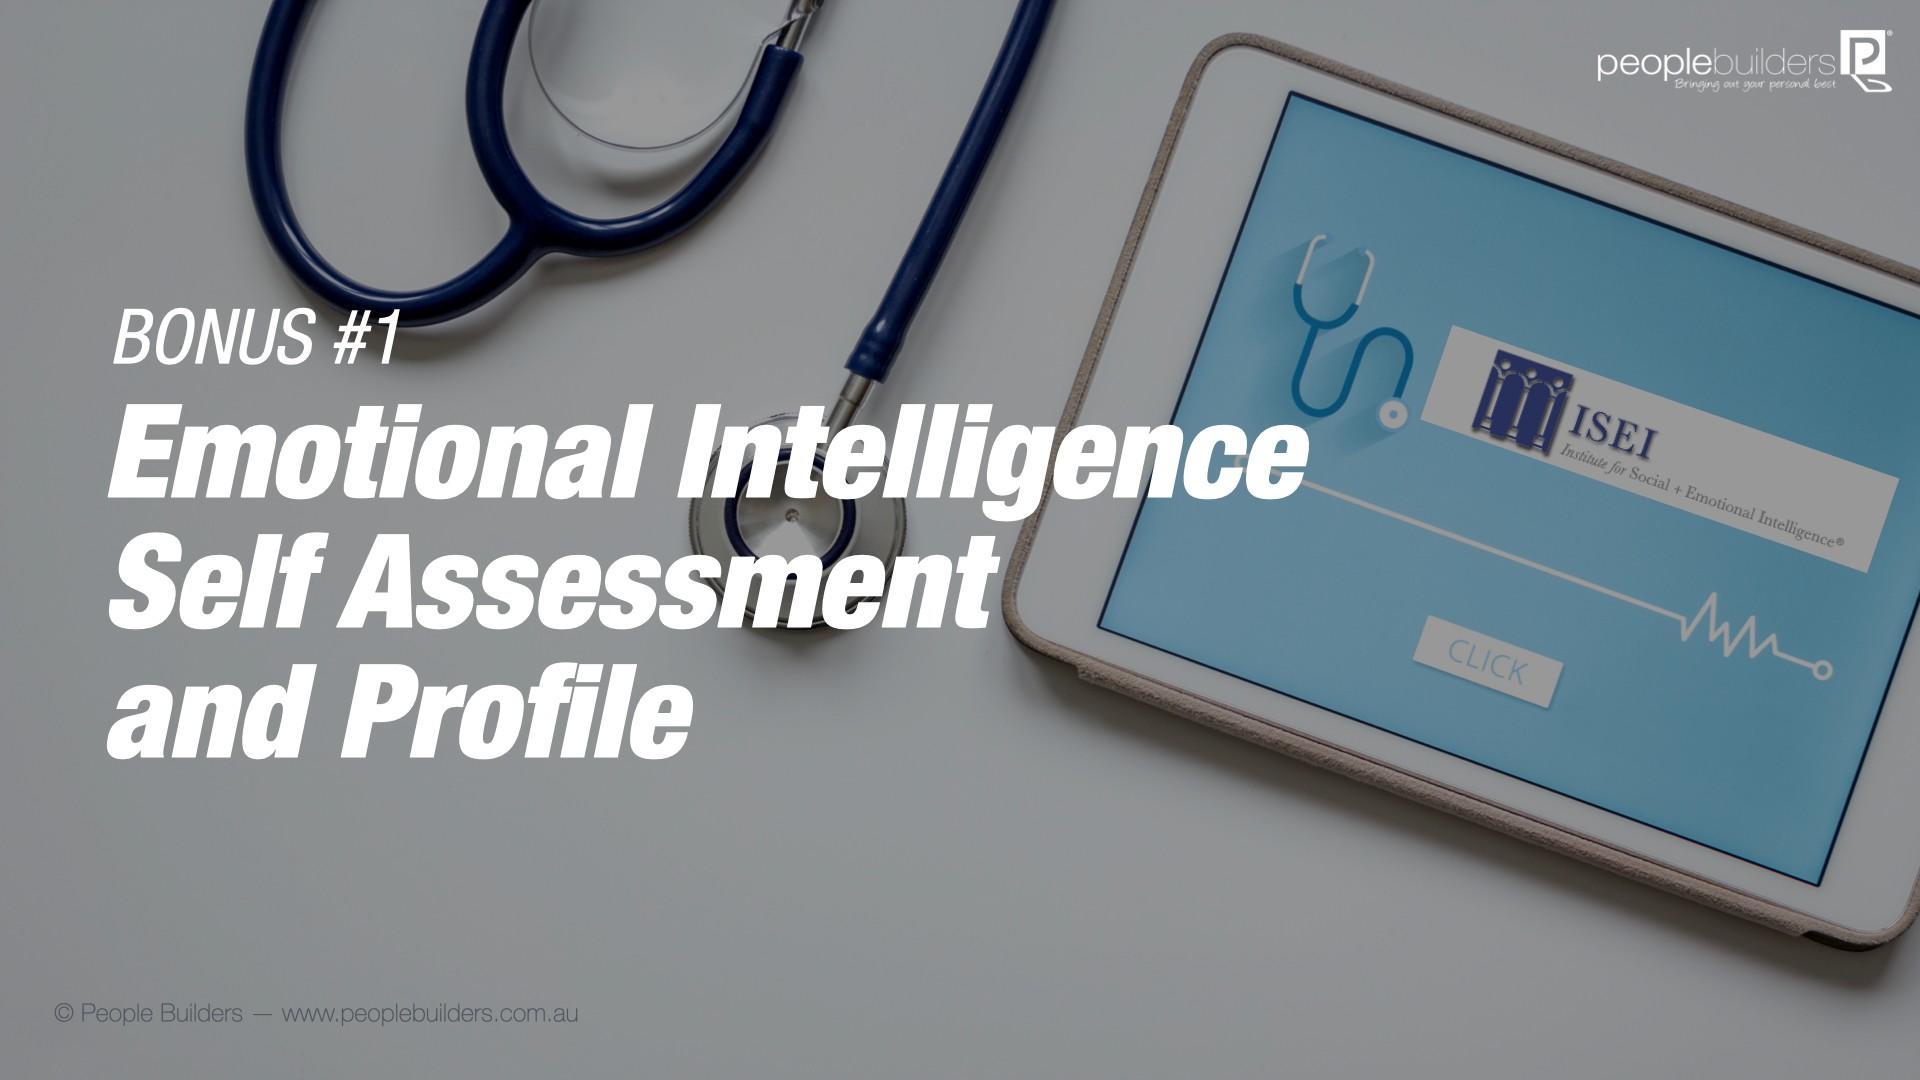 Bonus #1 Emotional Intelligence Self Assessment and Profile